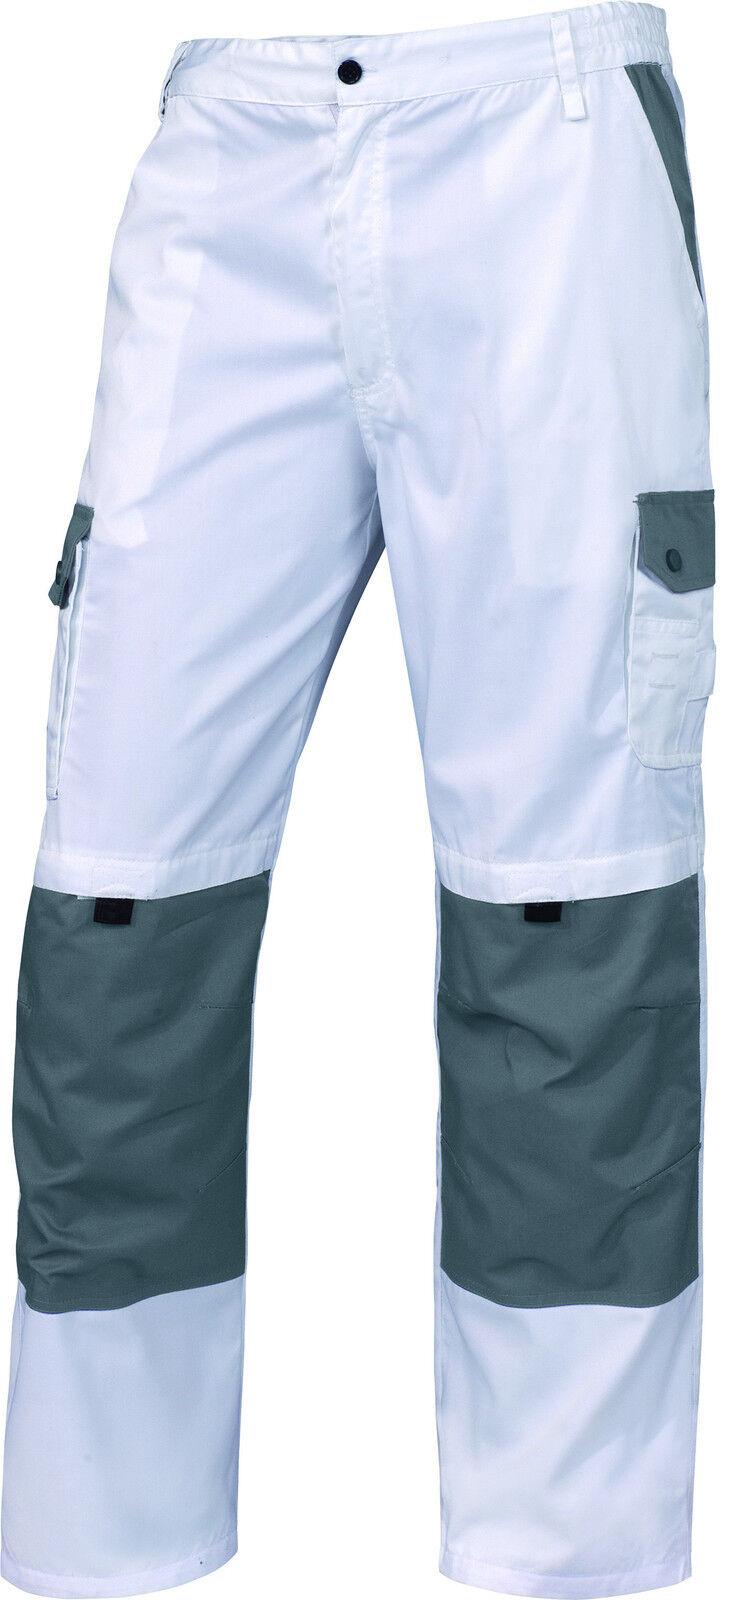 Delta Plus Panoply Latina whiteo Pantalones para Pintores Decoradores Trabajo